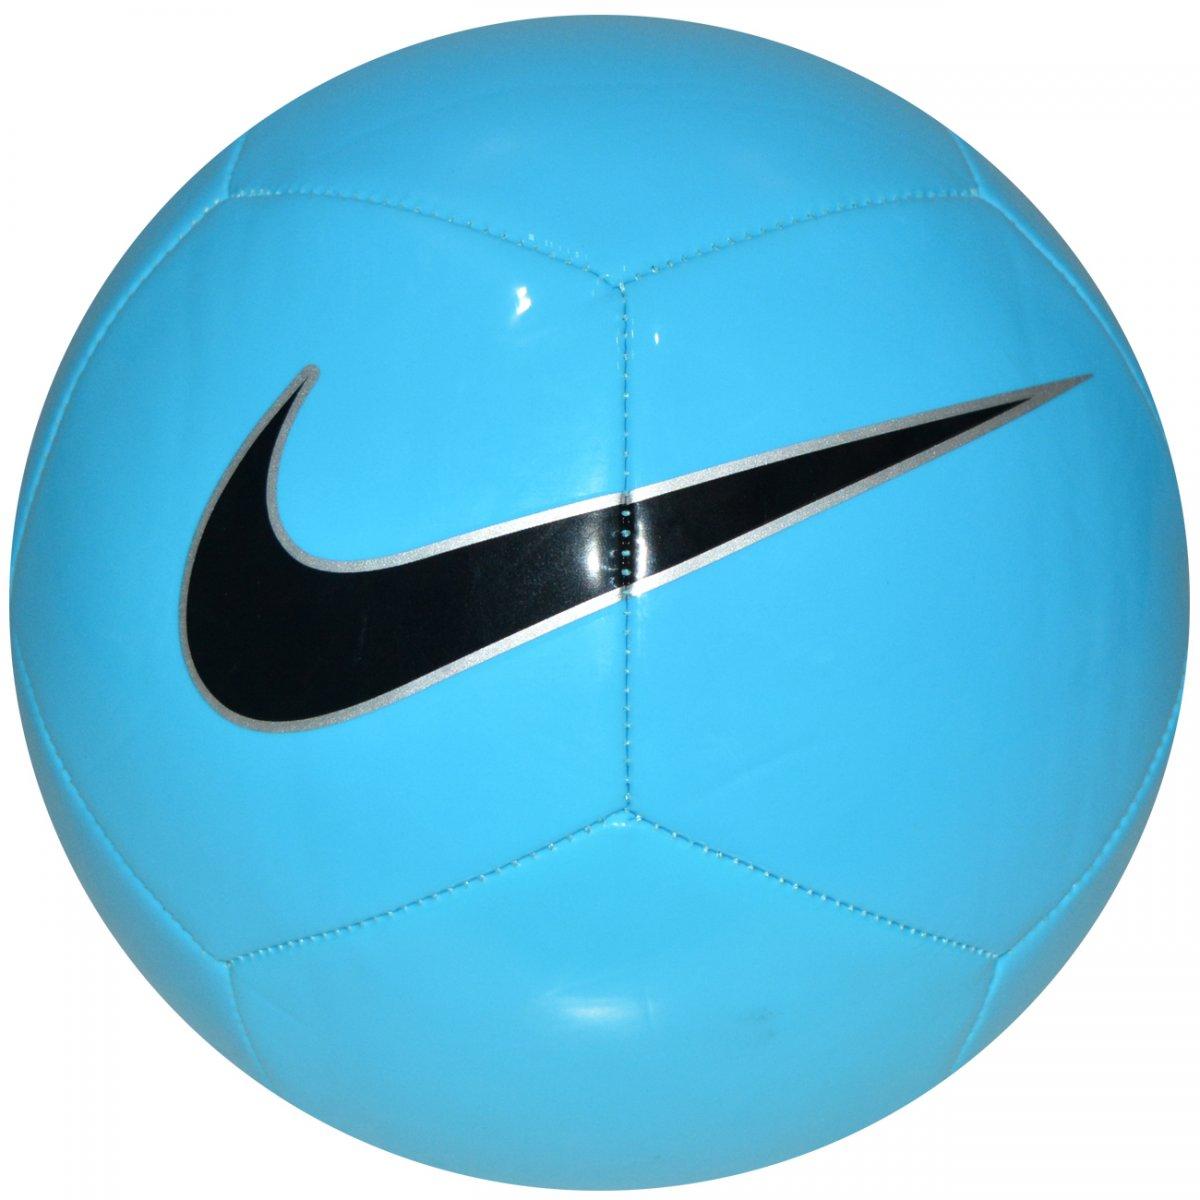 9b7a29d933 Bola Nike Pitch Training SC3101 413 - Azul preto prata - Chuteira Nike